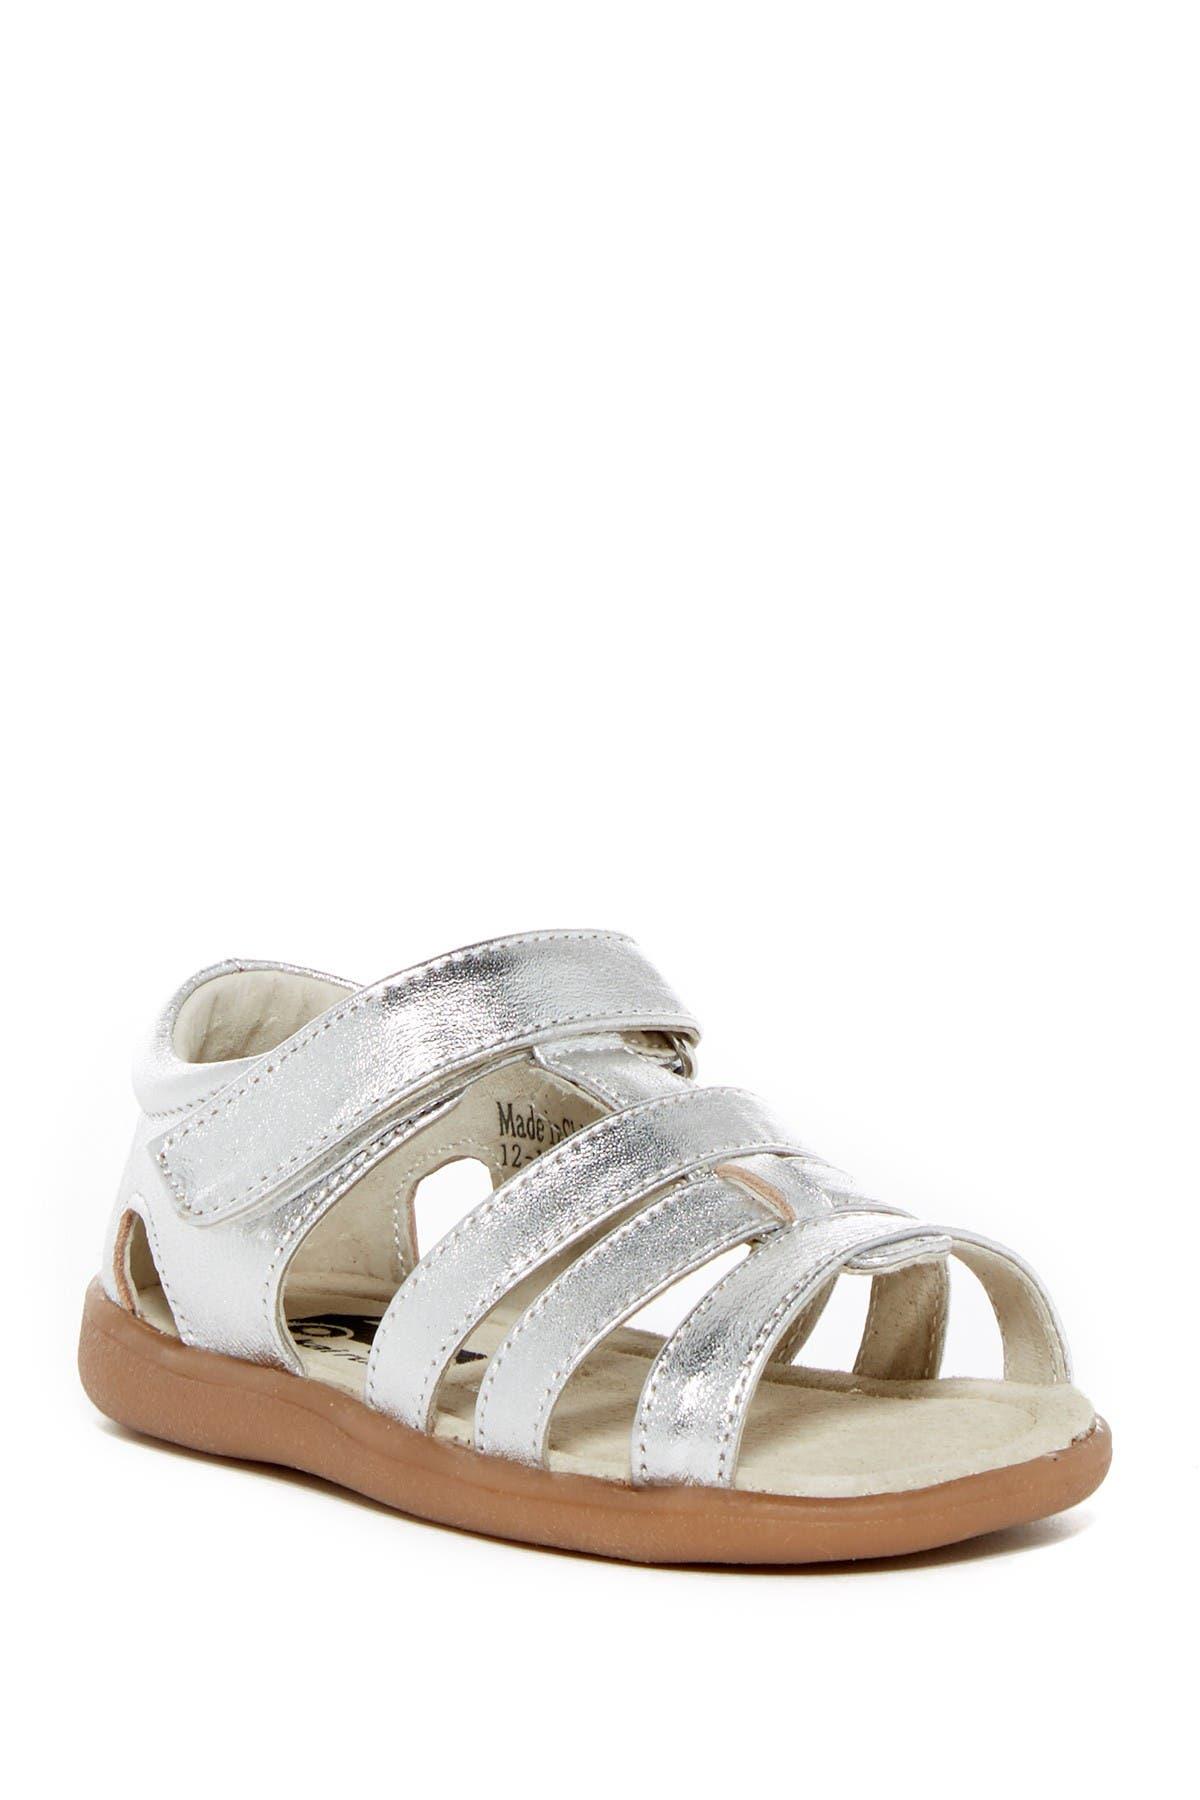 See Kai Run | Fe Metallic Sandal